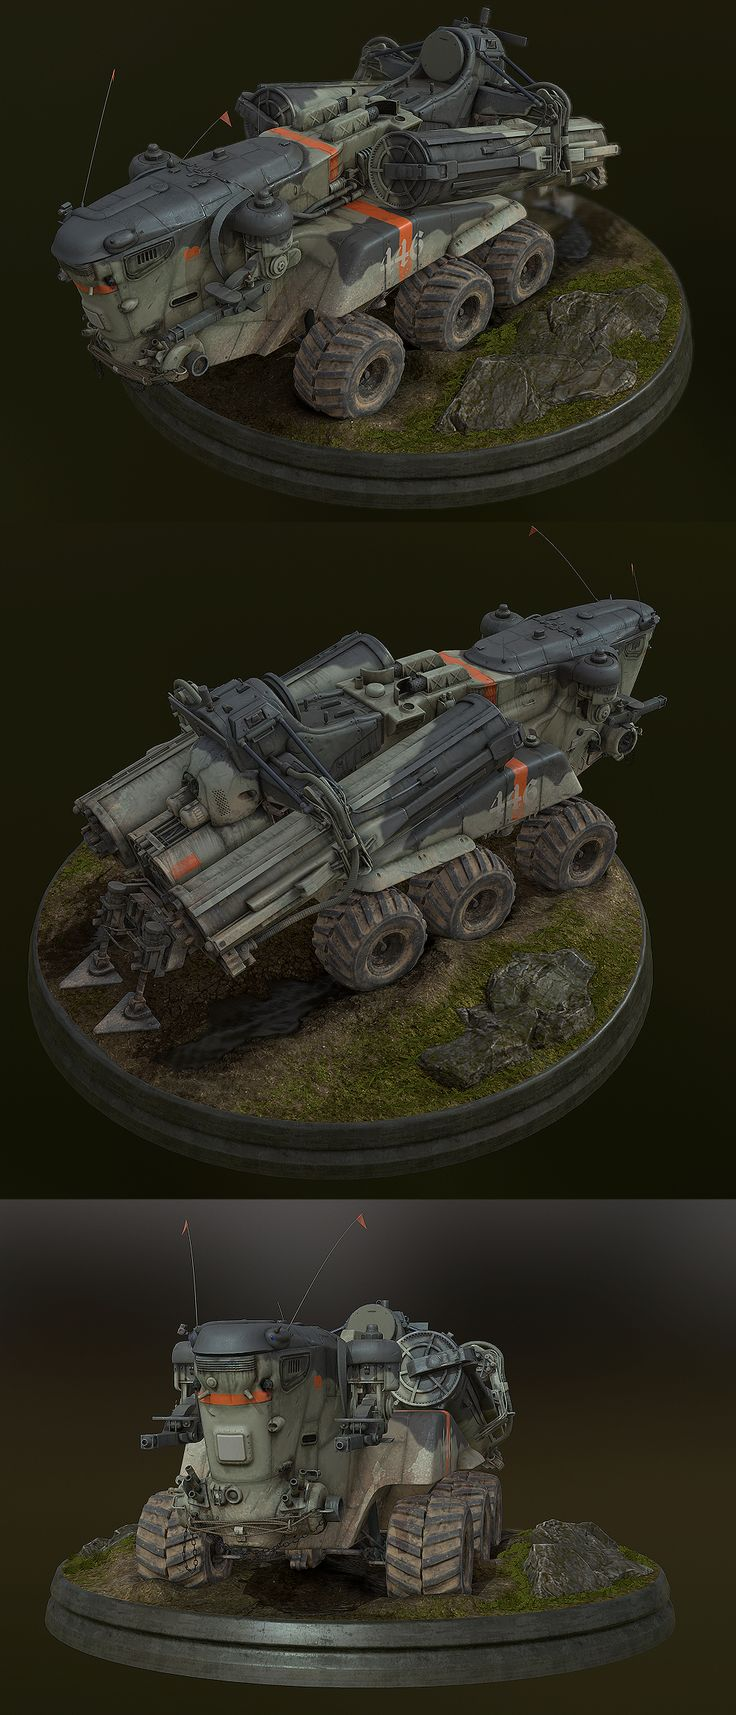 Marble bardler military vehiclescool